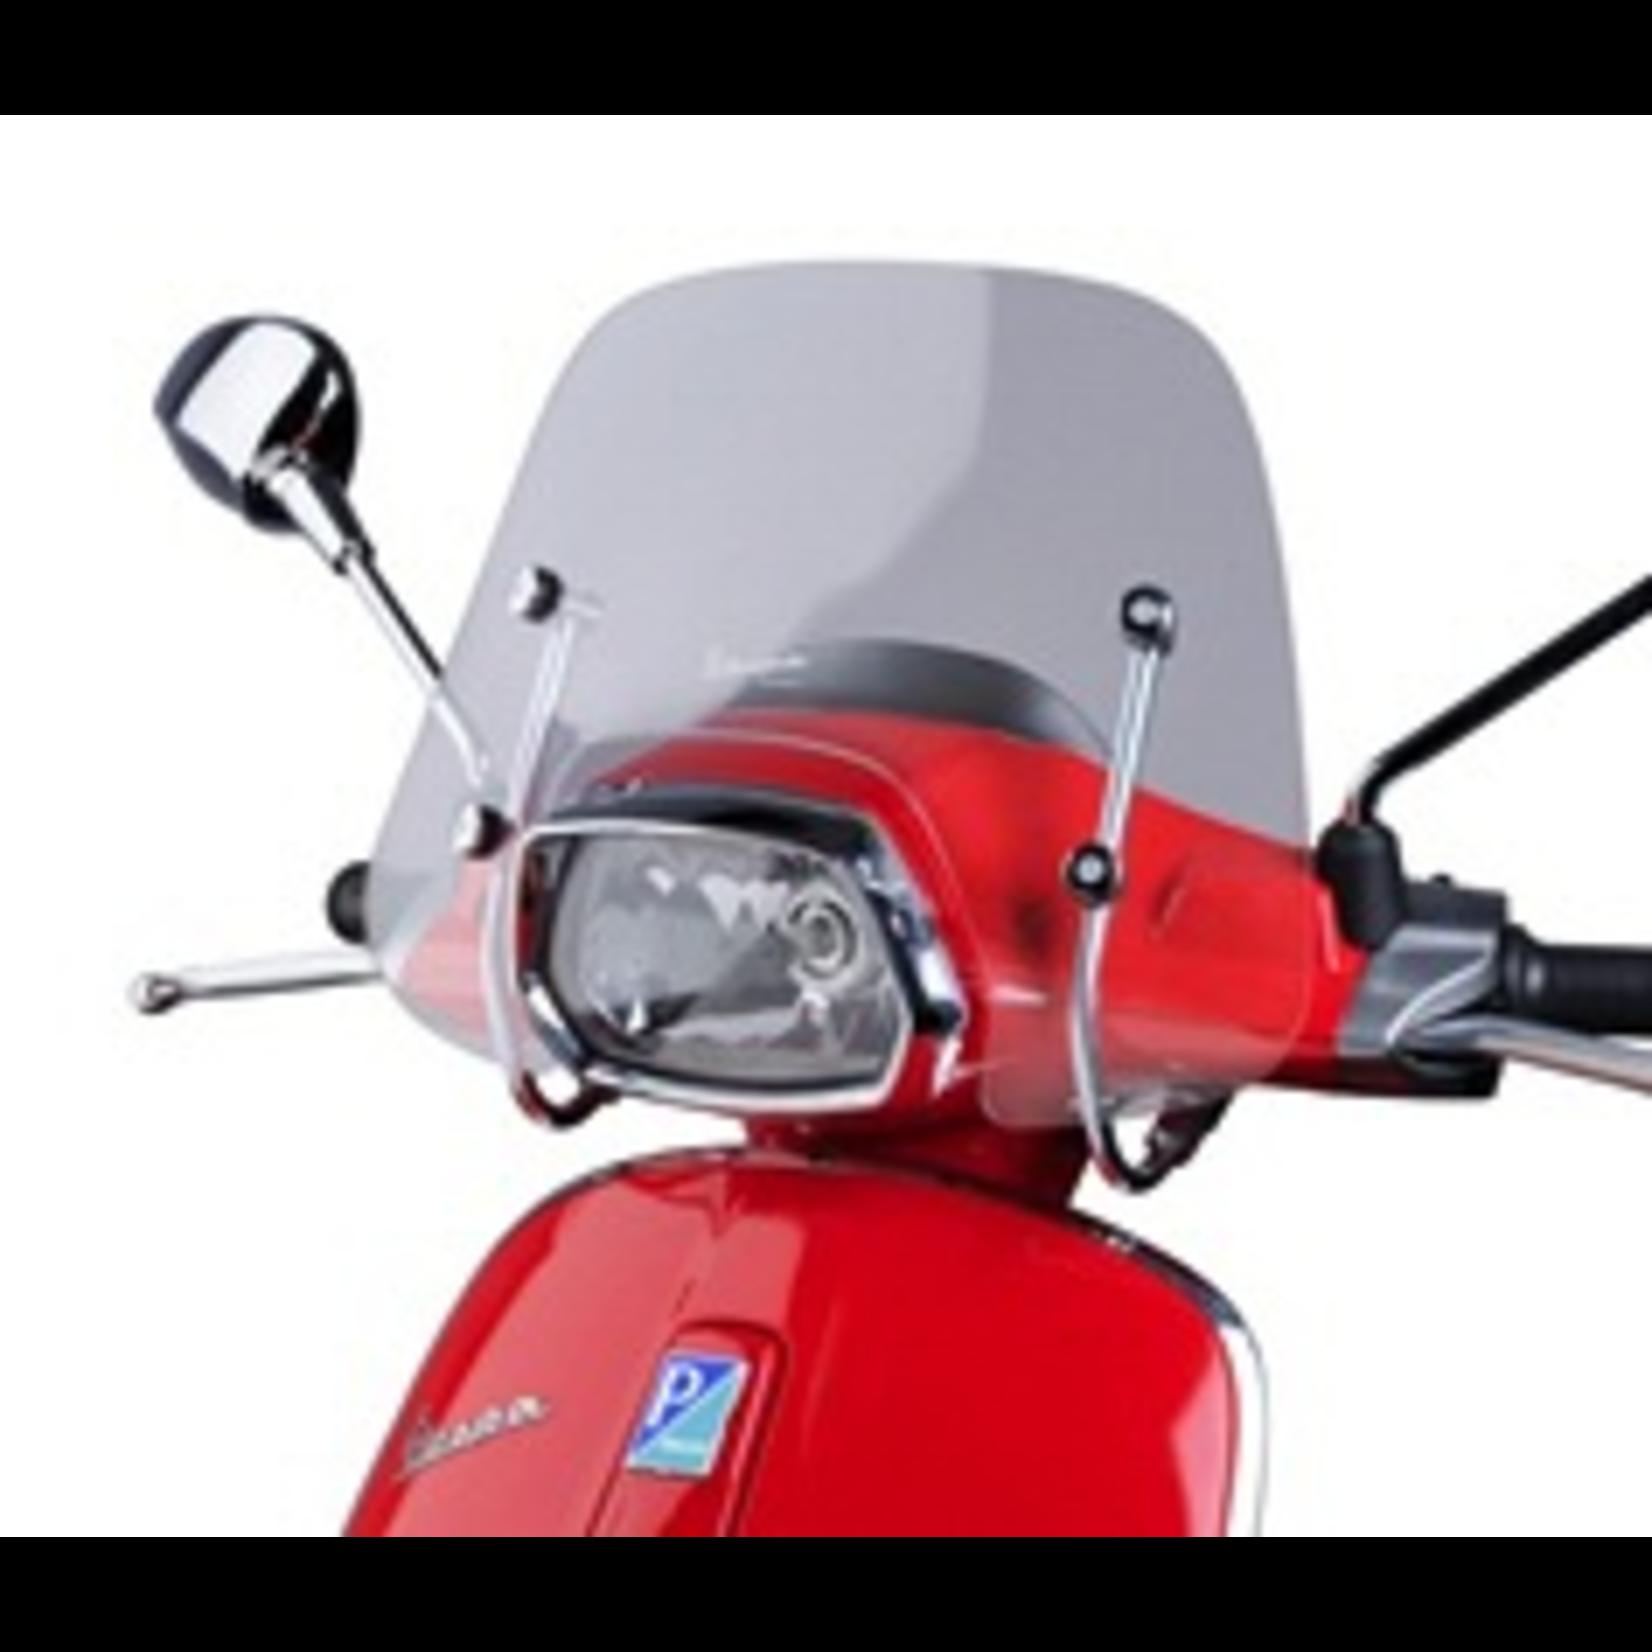 Accessories Windshield, Vespa Sprint 50/150 Clear